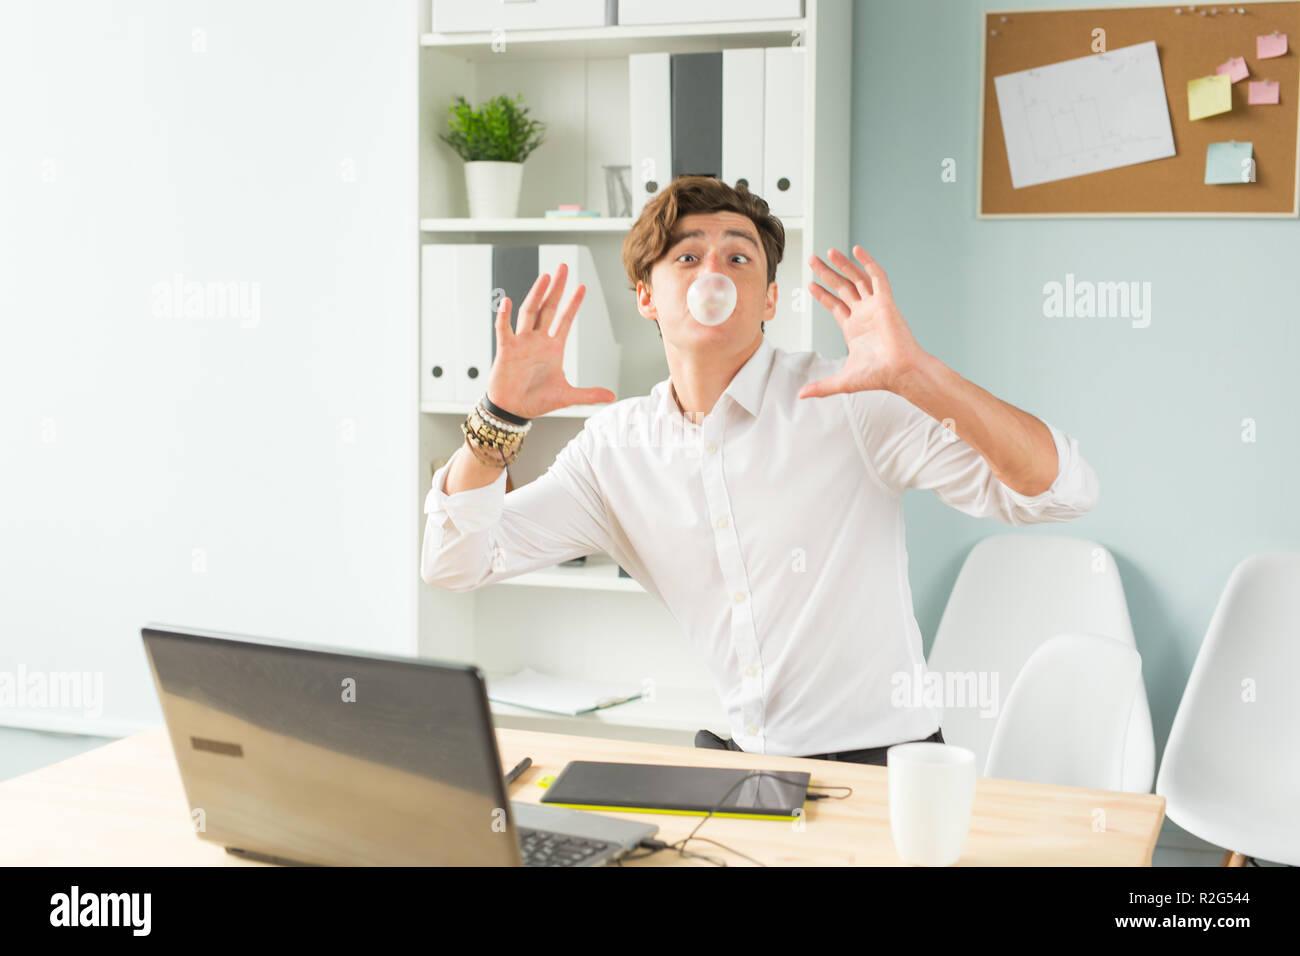 Sexvideos Website